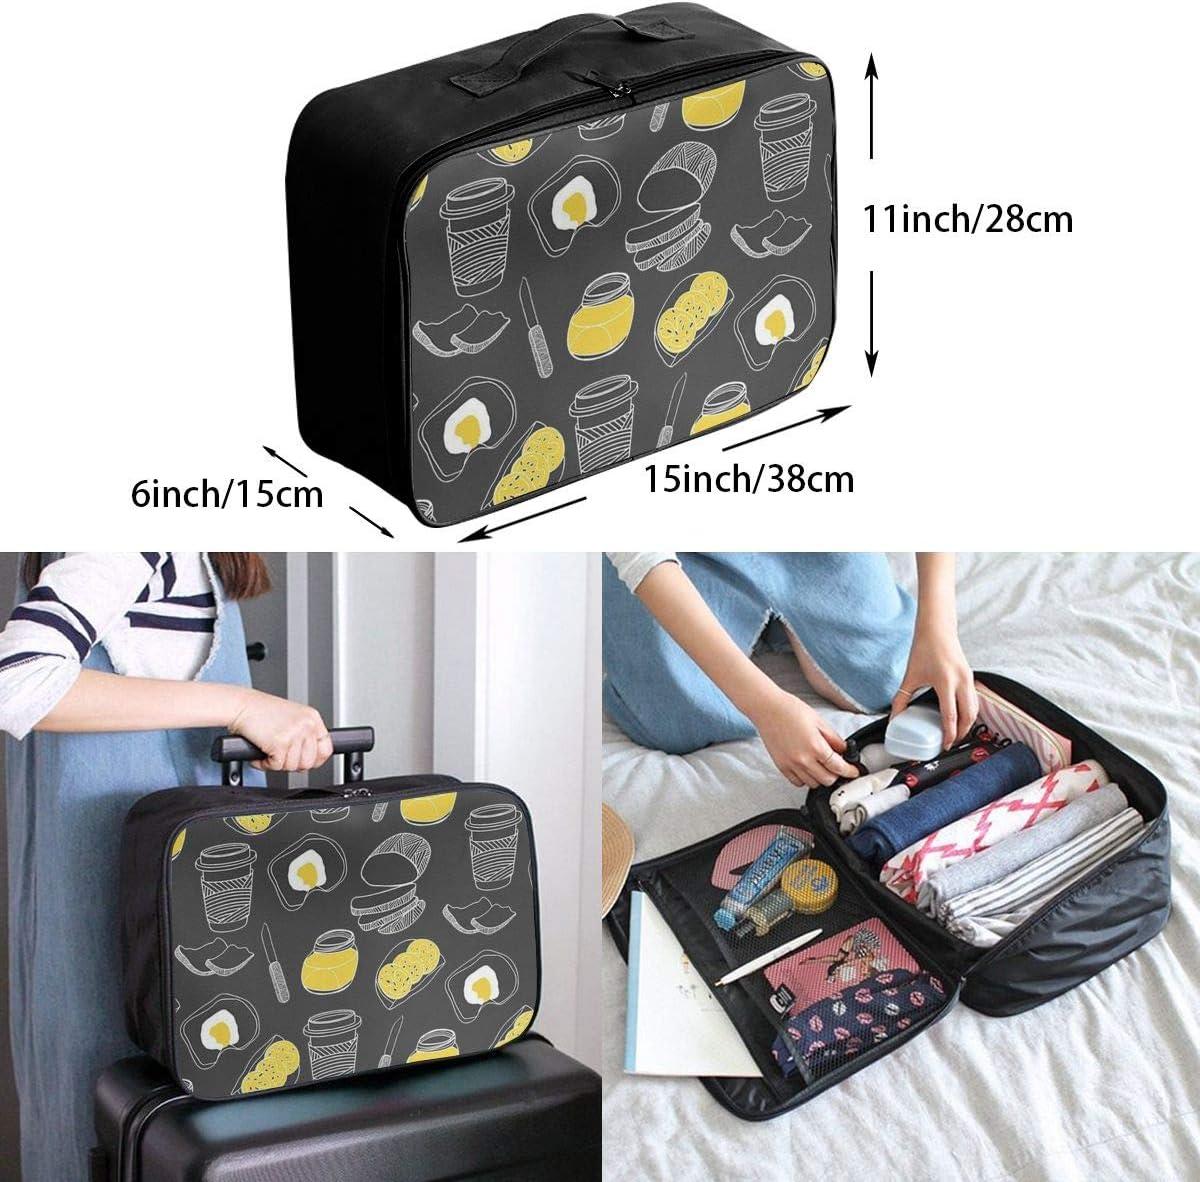 Breakfast Travel Carry-on Luggage Weekender Bag Overnight Tote Flight Duffel In Trolley Handle